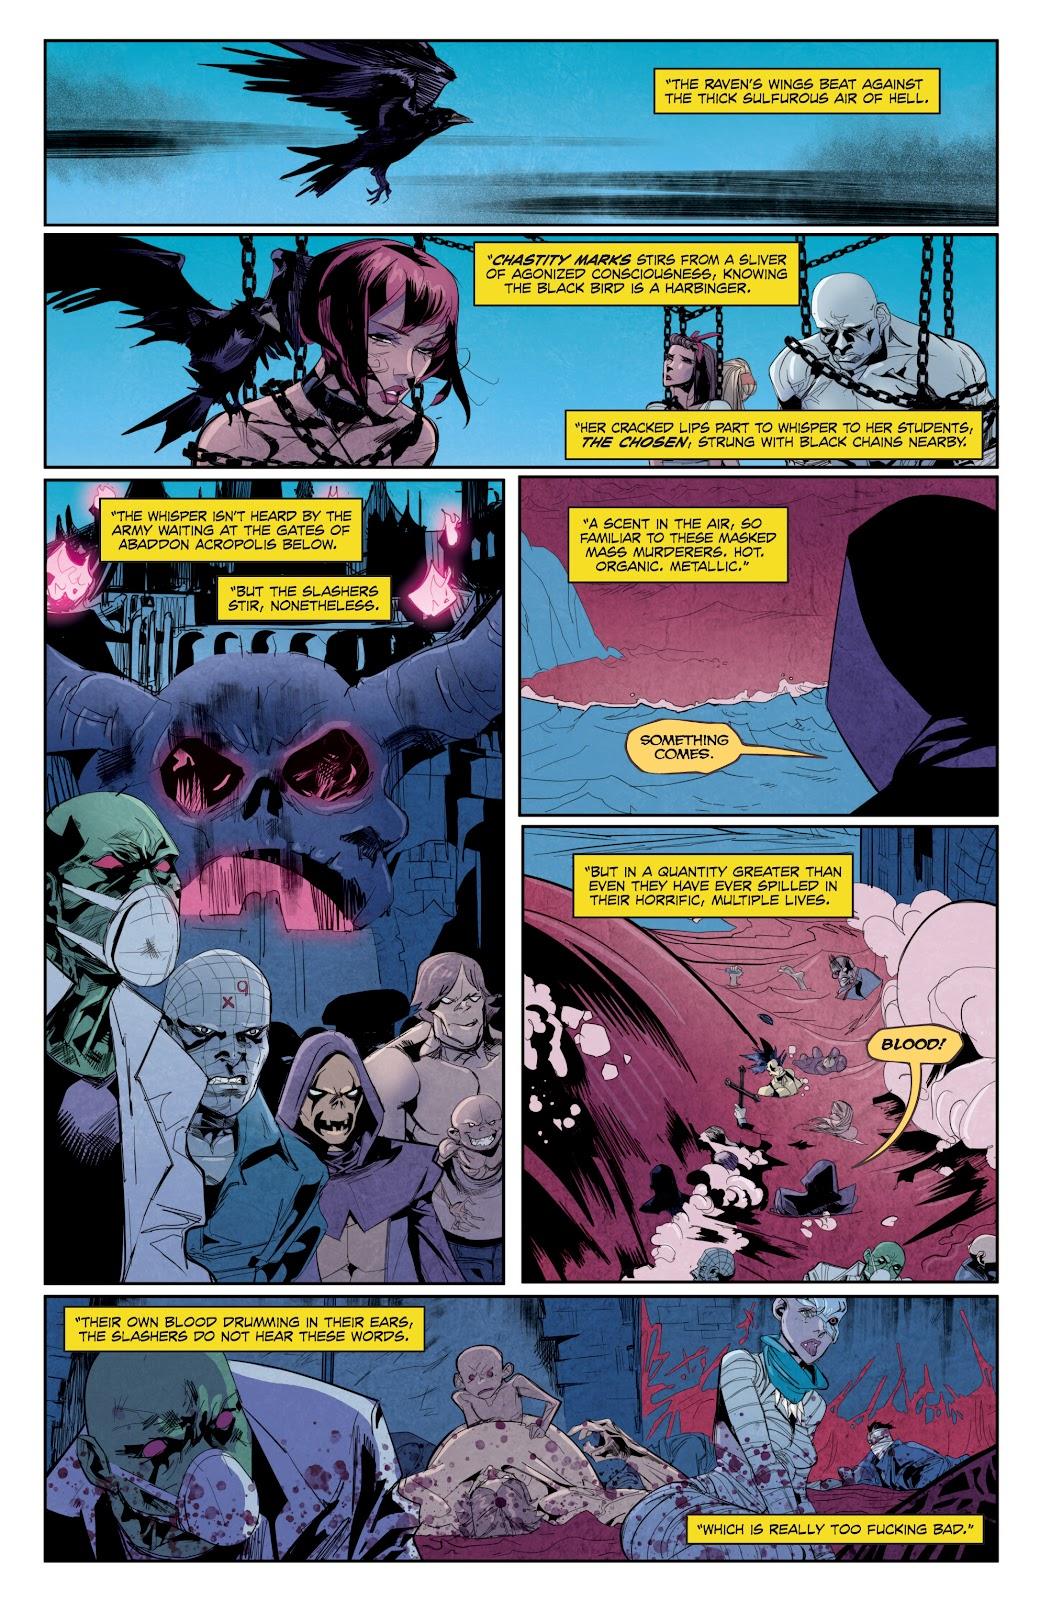 Read online Hack/Slash vs. Chaos comic -  Issue #5 - 5